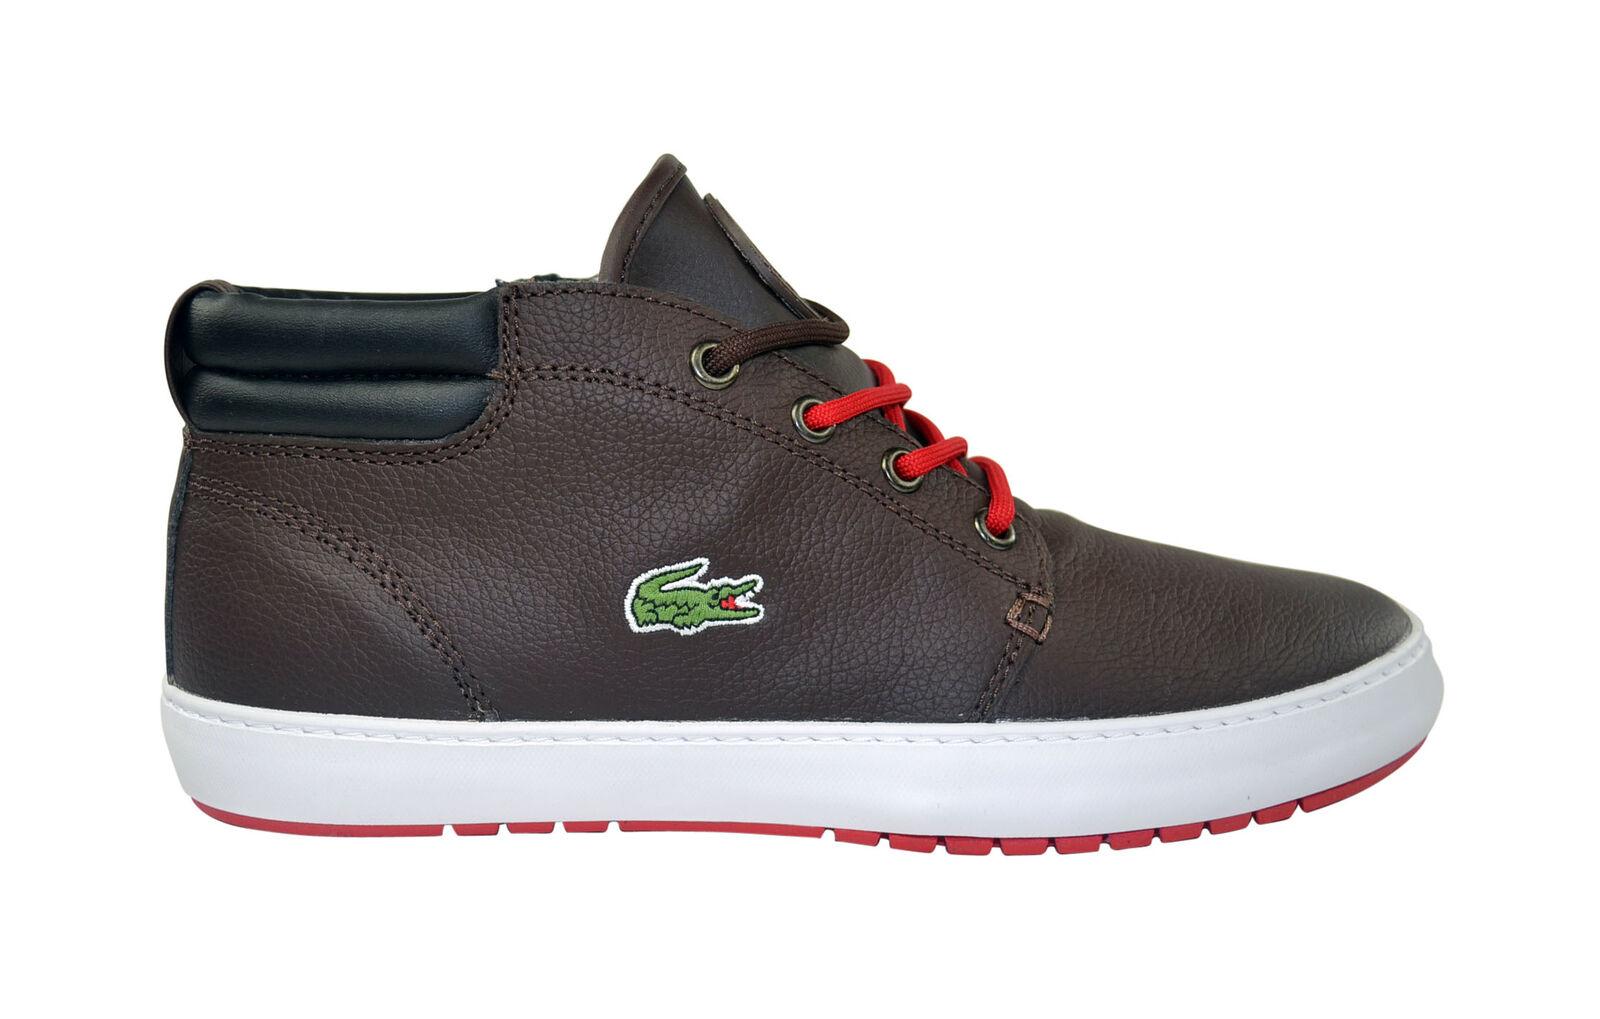 Lacoste Ampthill Terra URW SPM dk brown/black Schuhe/Sneaker Gr.40